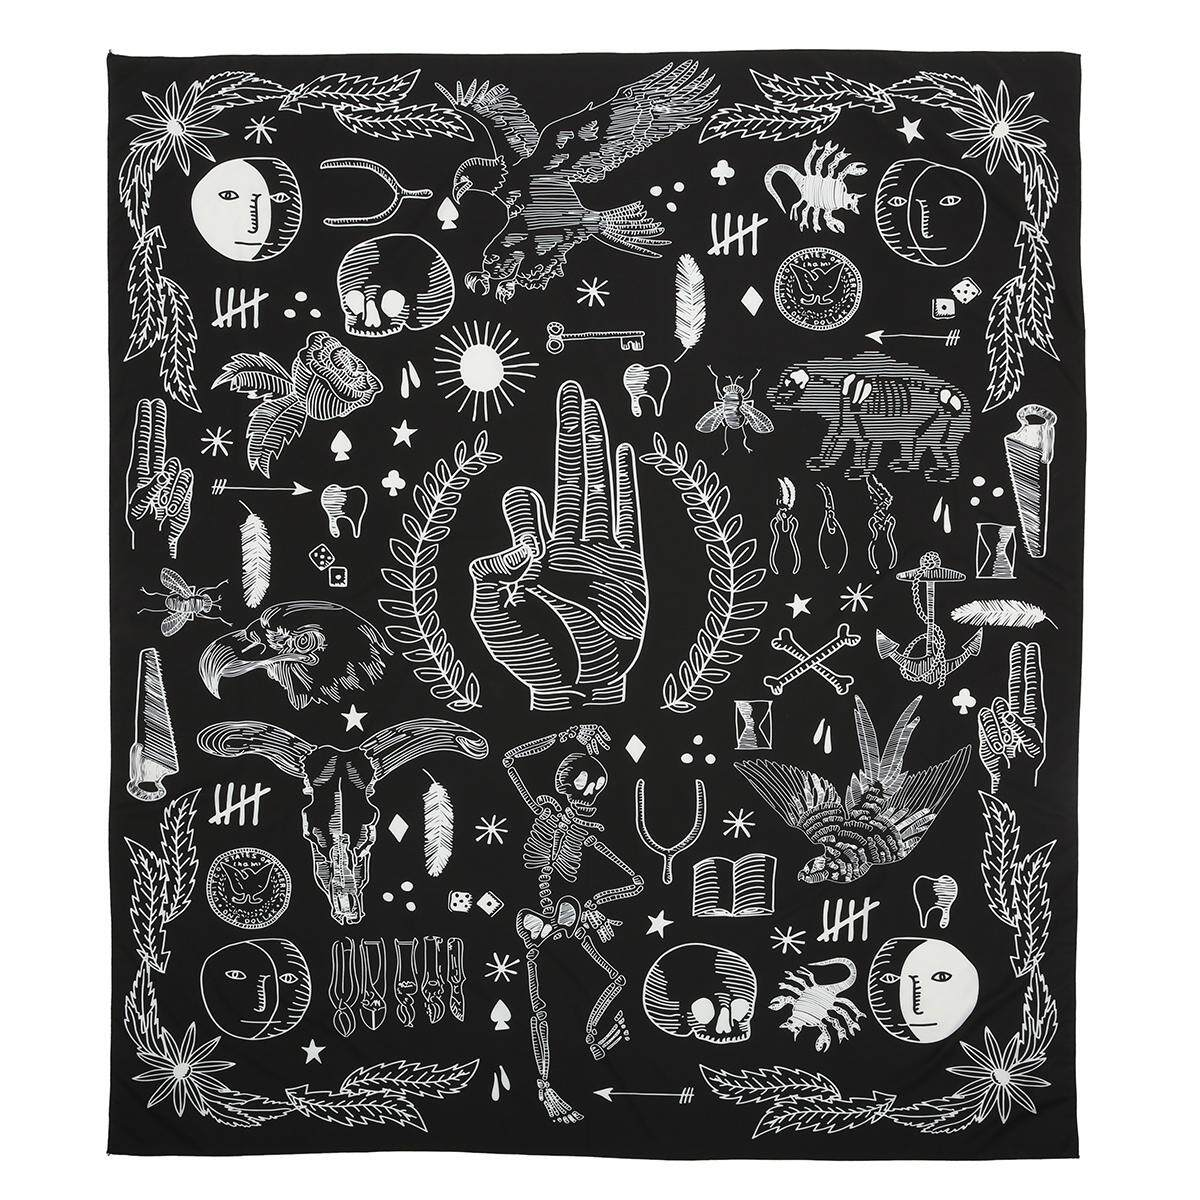 Eagle Bear Rose Flower Wall Hanging Tapestry 2017 New Design Black White Fashion Boho